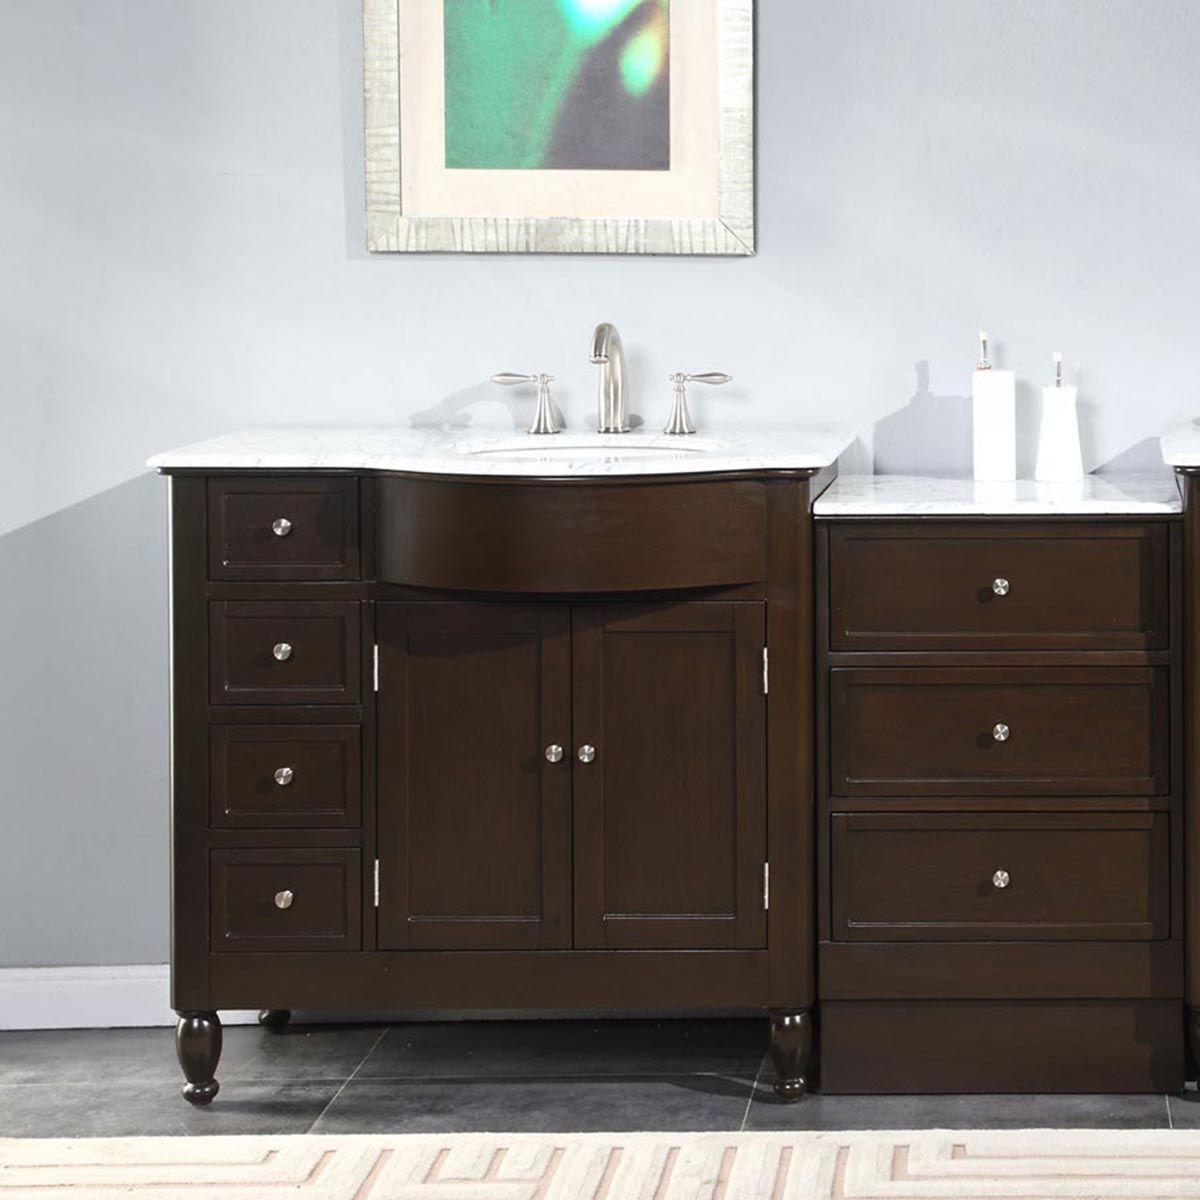 30+ Sink on right side vanity best